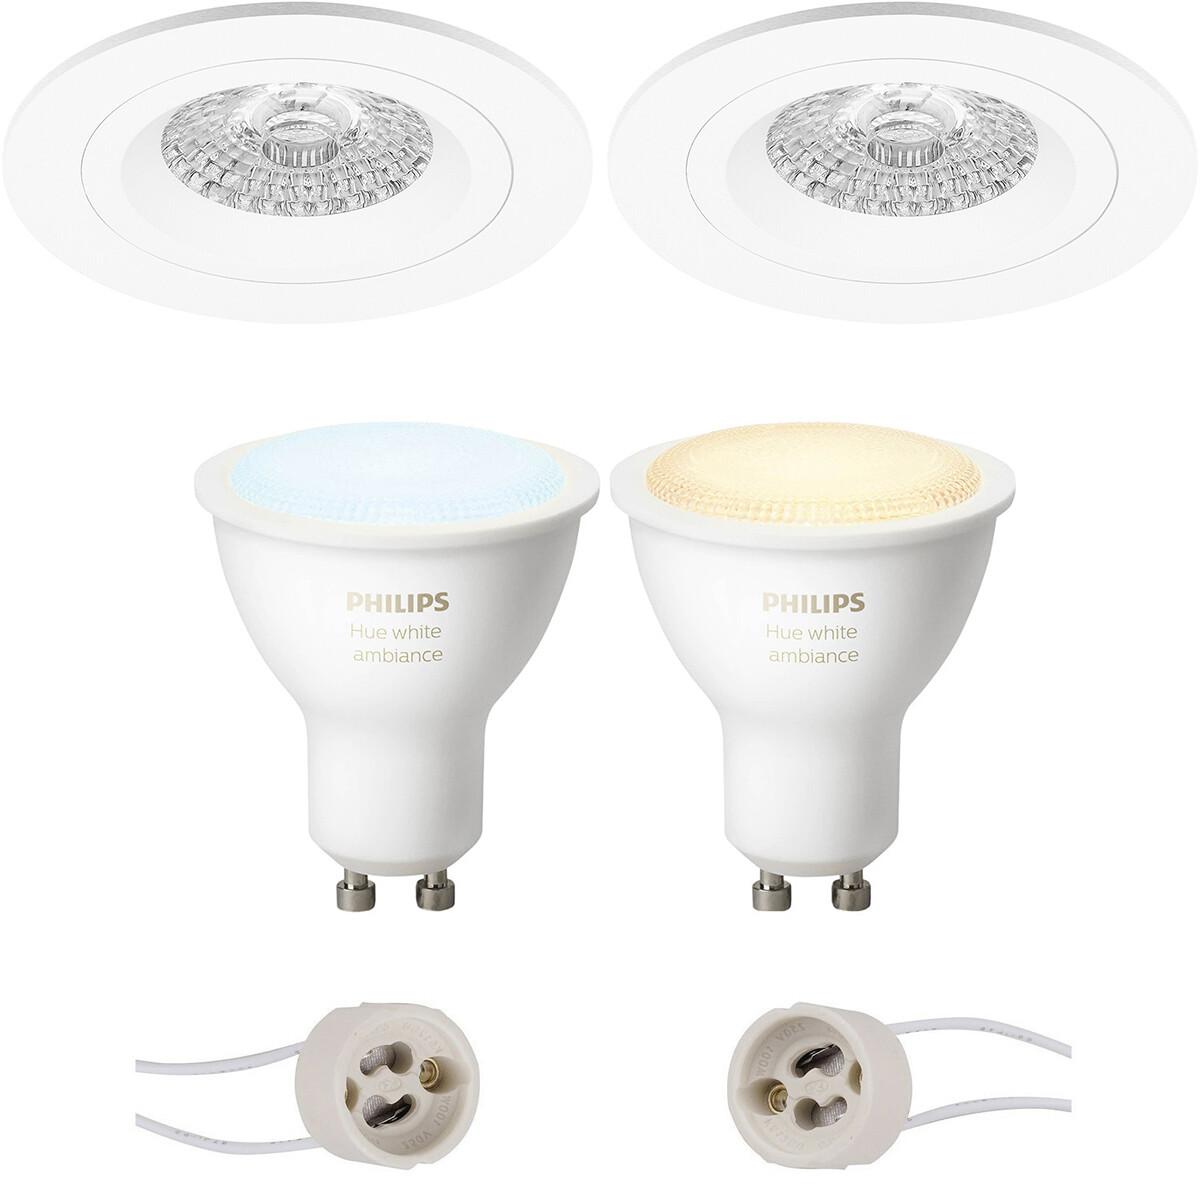 Pragmi Rodos Pro - Inbouw Rond - Mat Wit - Ø93mm - Philips Hue - LED Spot Set GU10 - White Ambiance